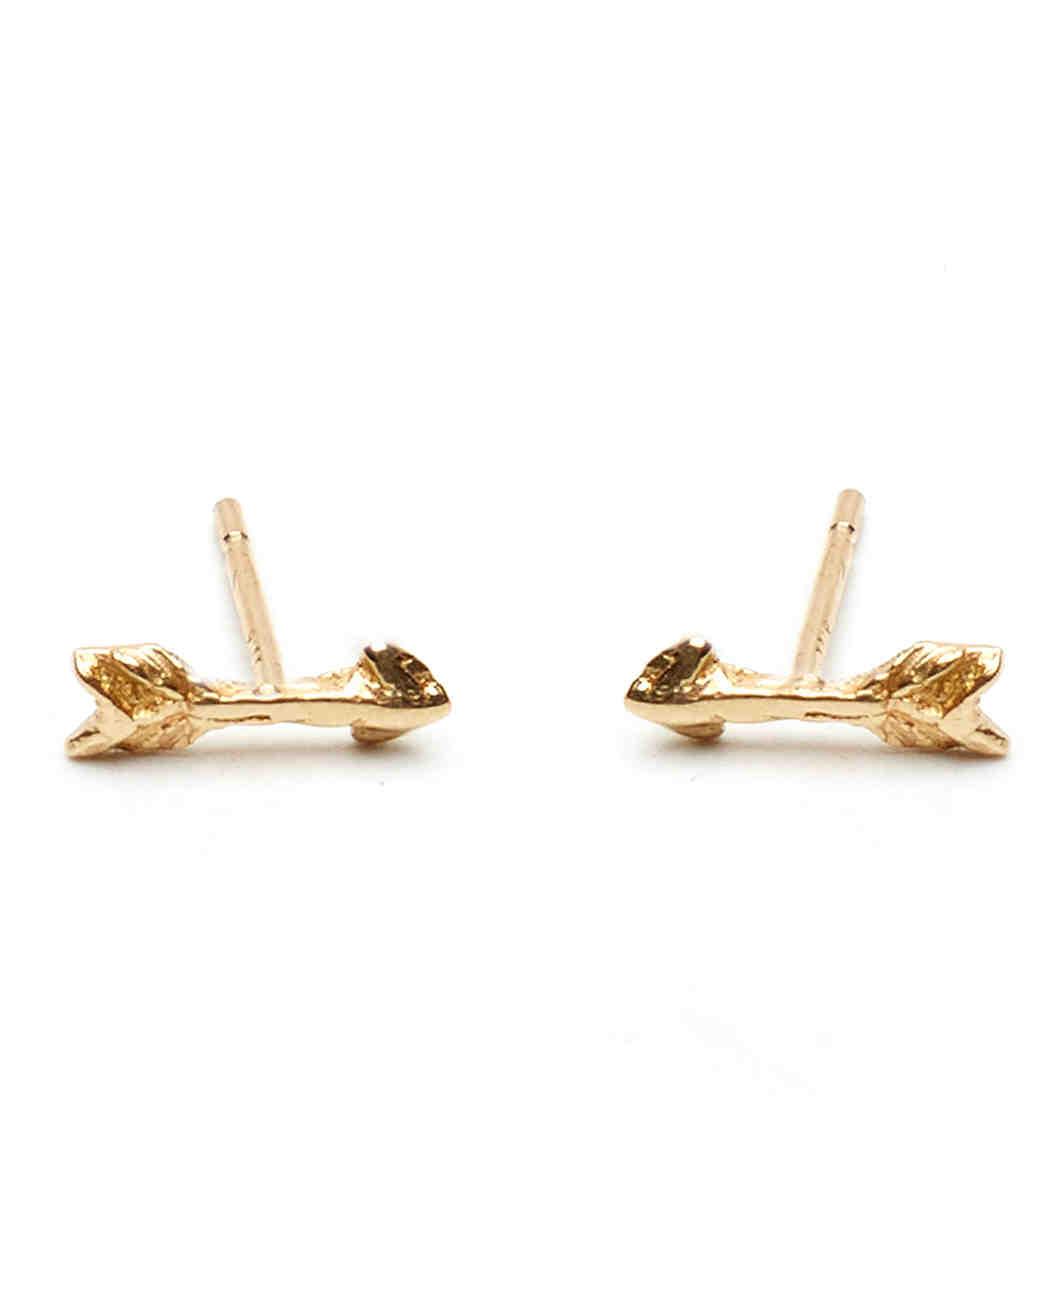 valentines-gift-guide-her-odette-arrow-earrings-0115.jpg